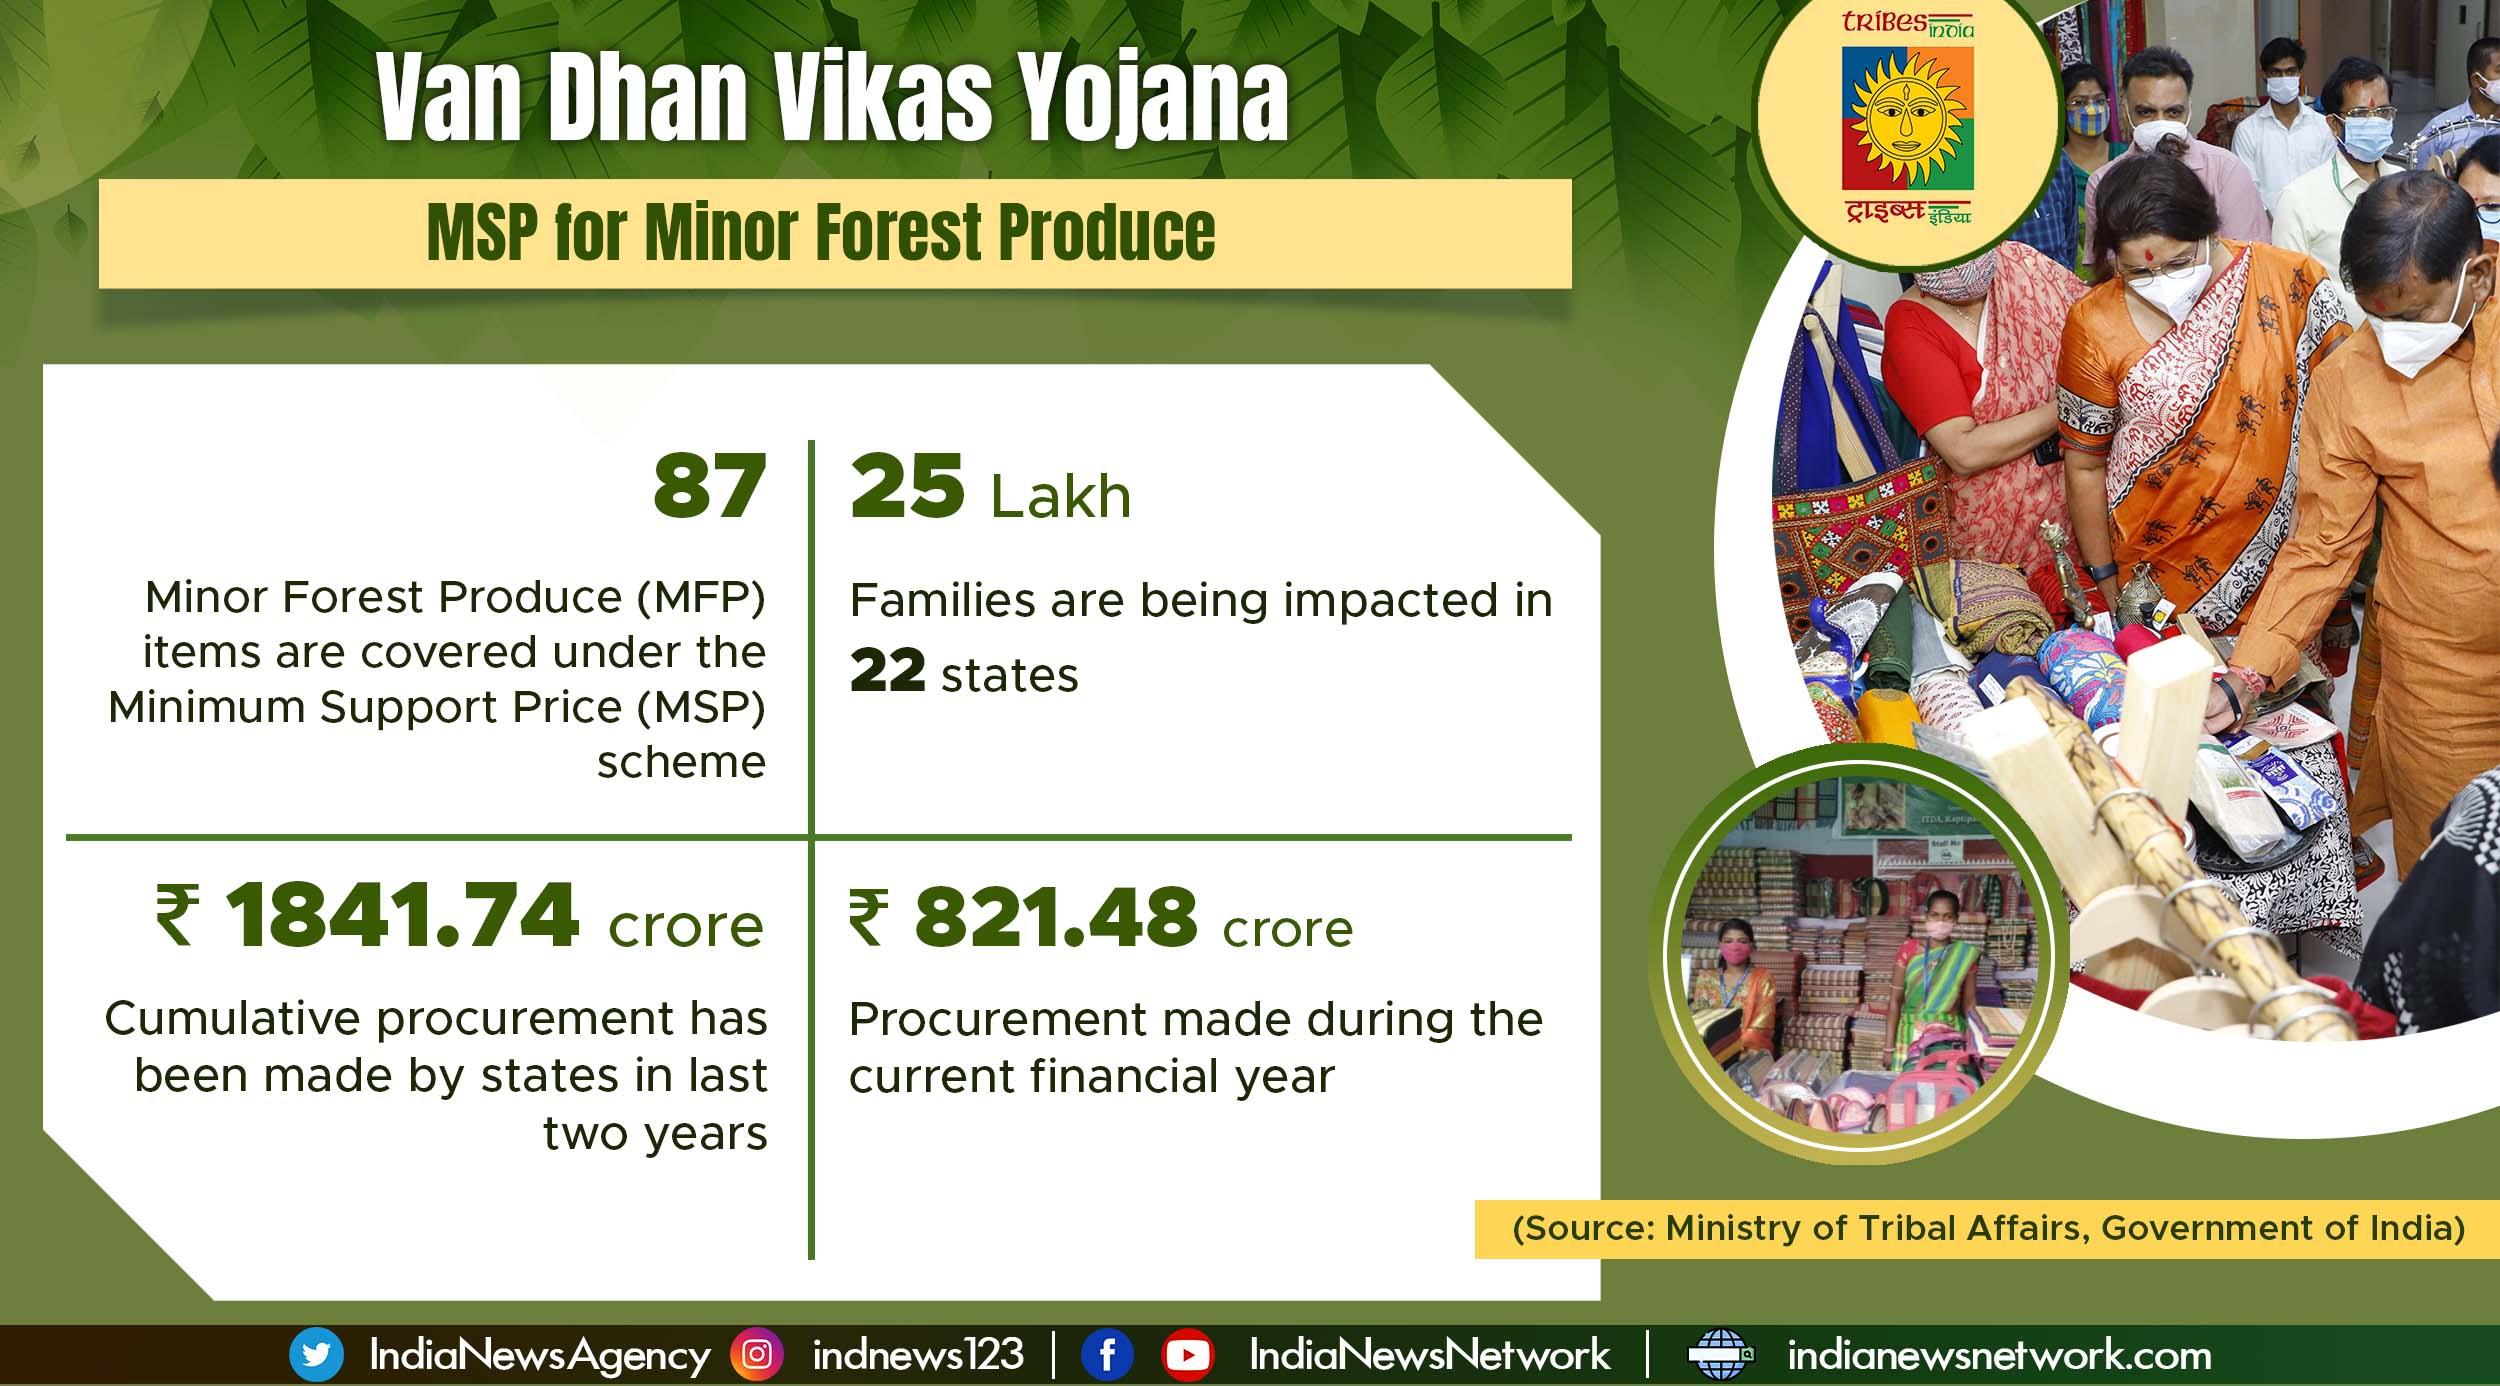 Van Dhan Vikas Yojana: A boon for tribals